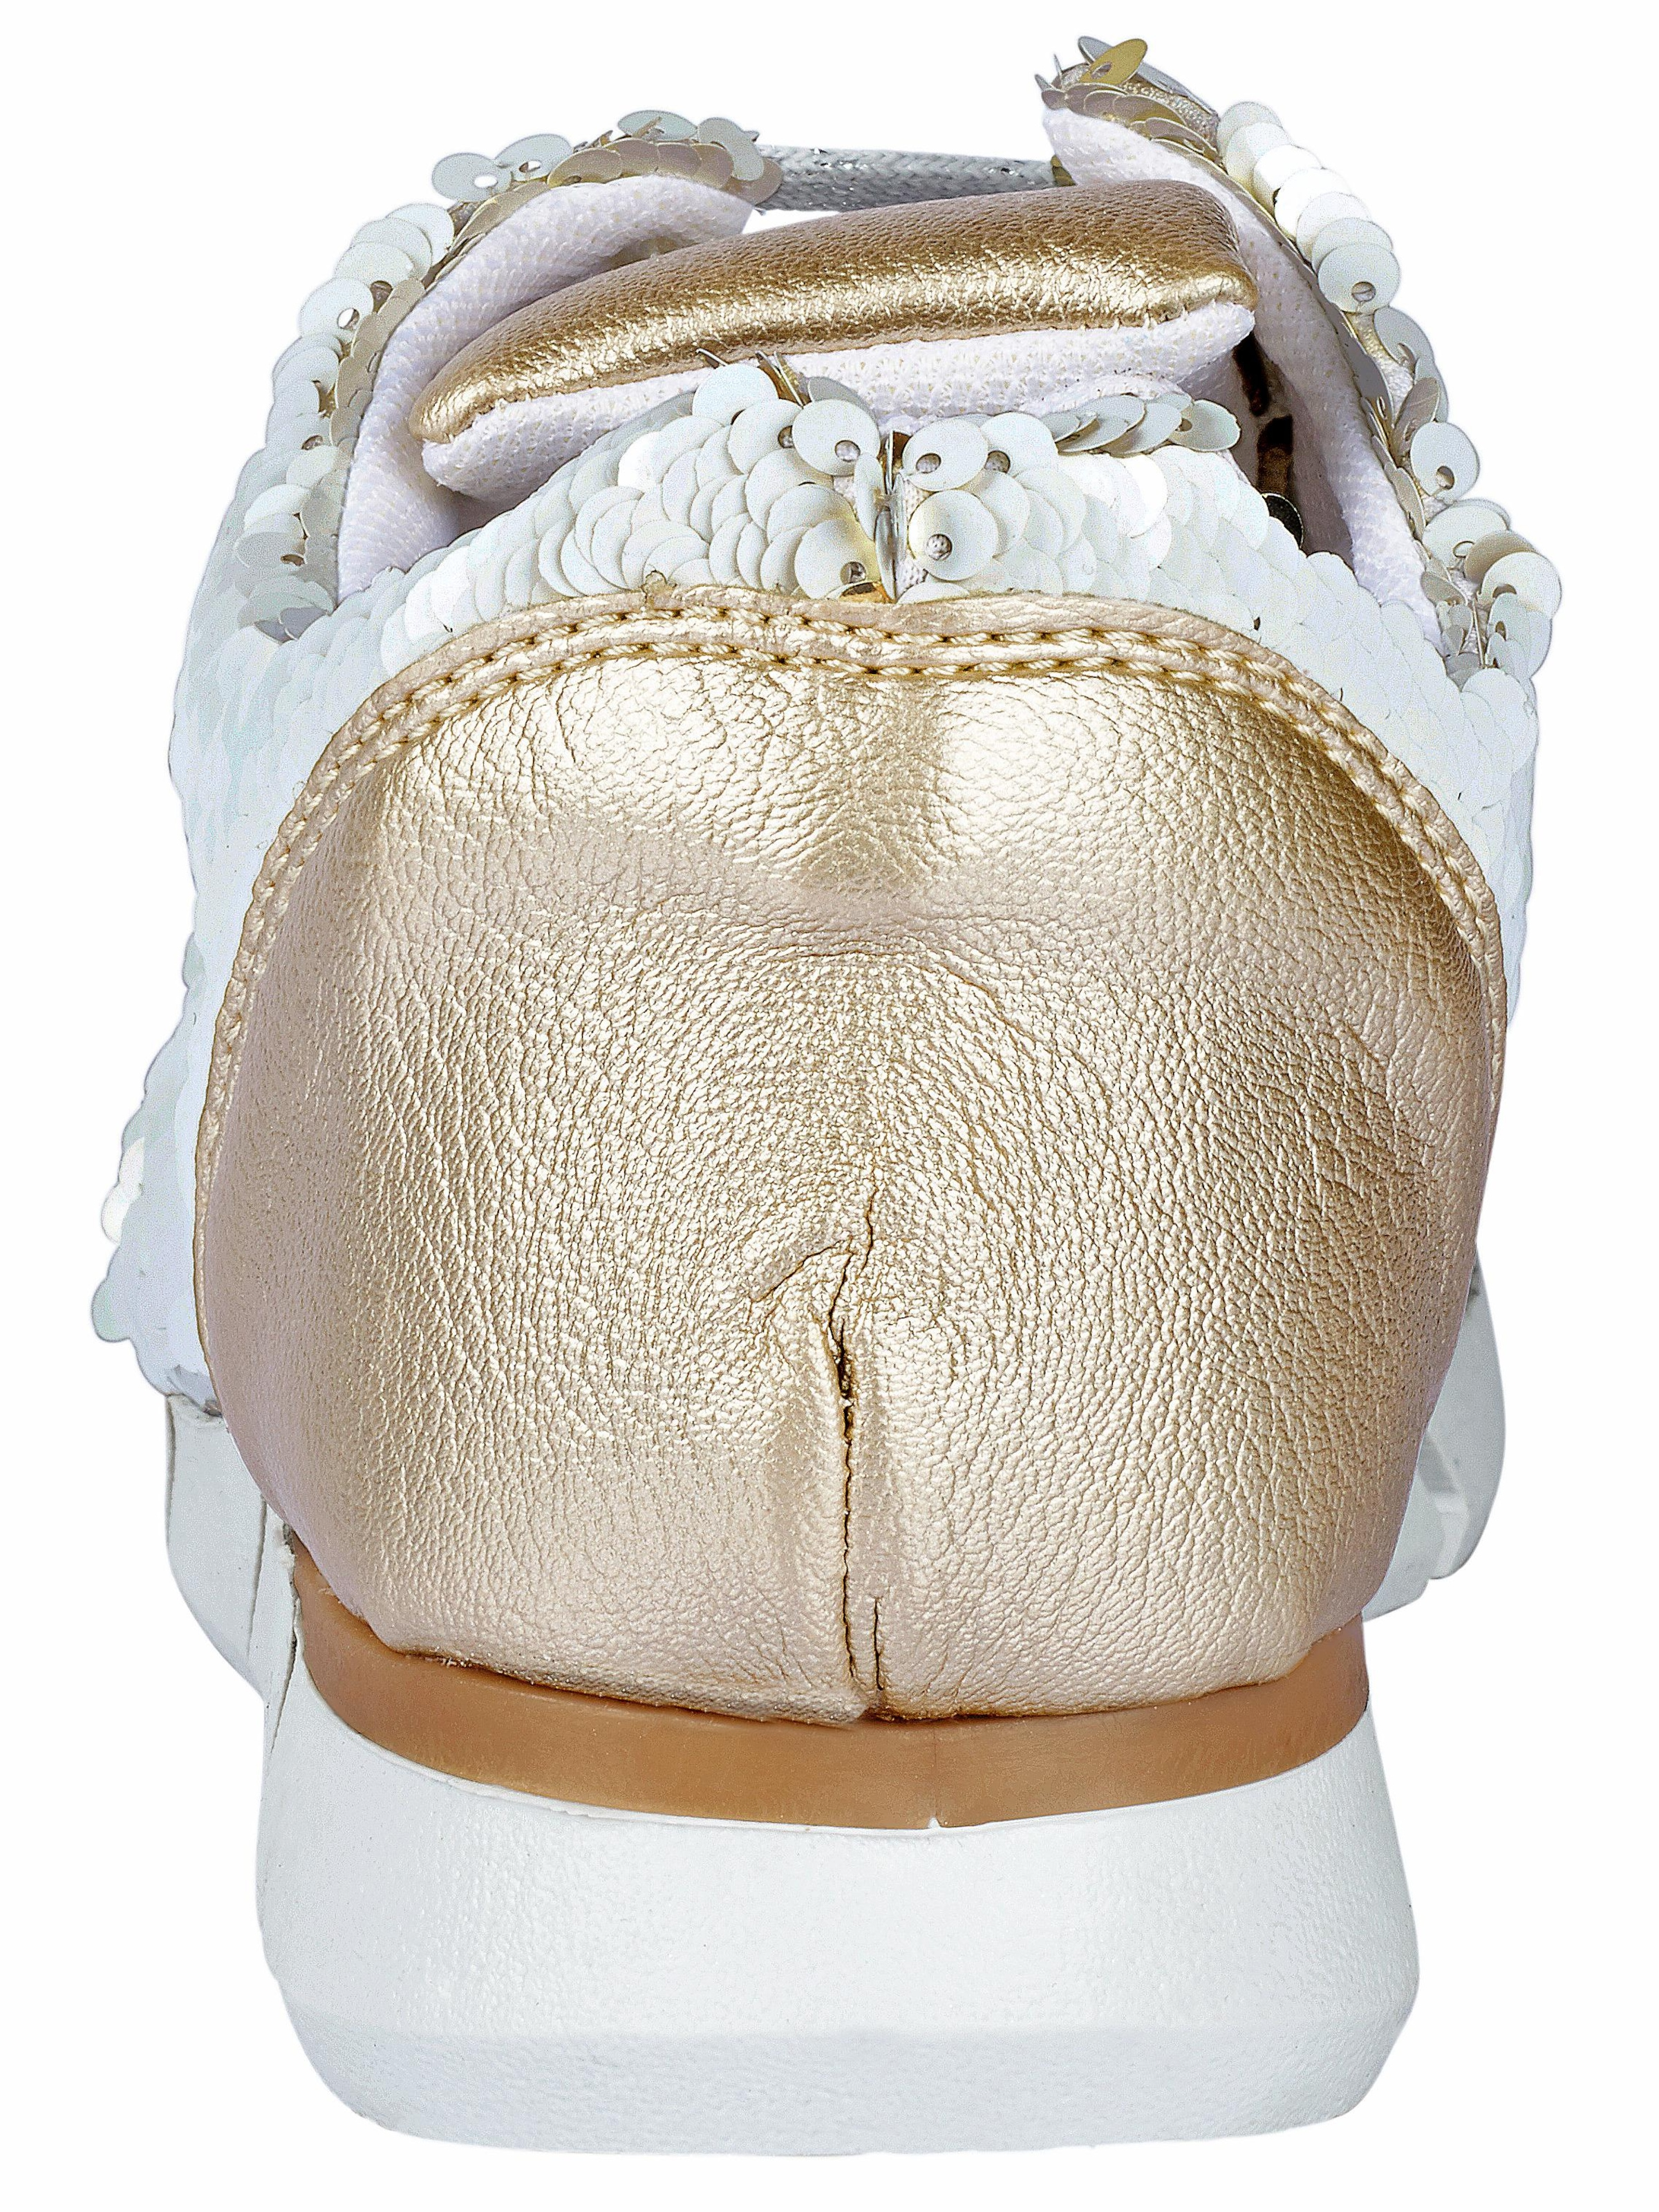 Conti GoldWeiß In pailletten Two tone Andrea Sneaker Mit sxtQhrdC